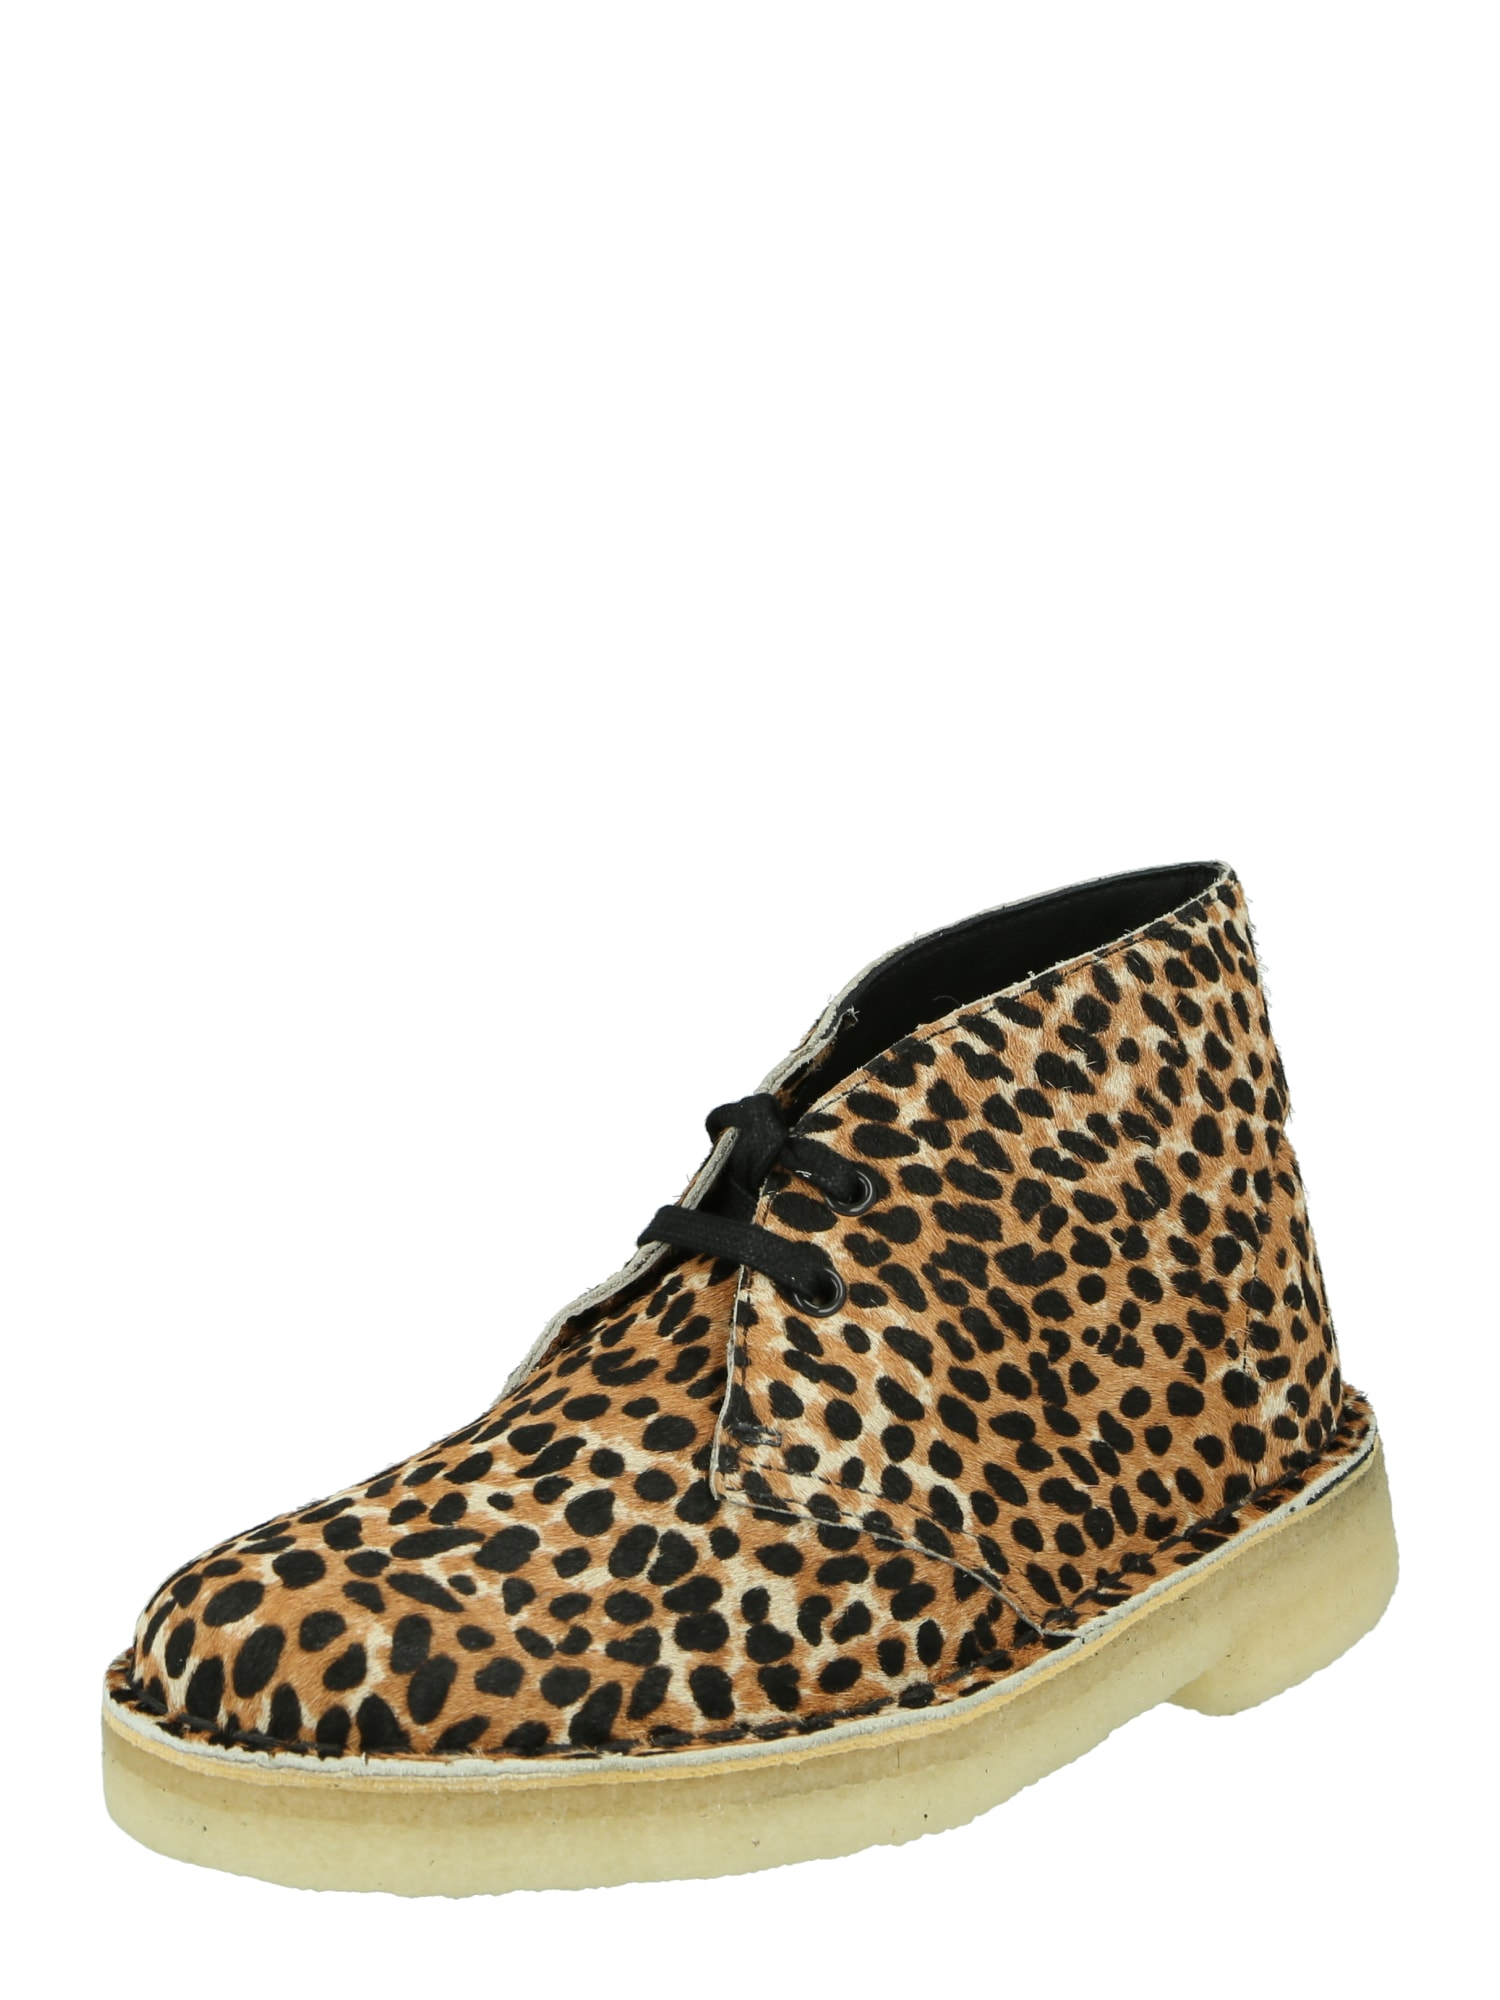 Clarks Originals Auliniai batai